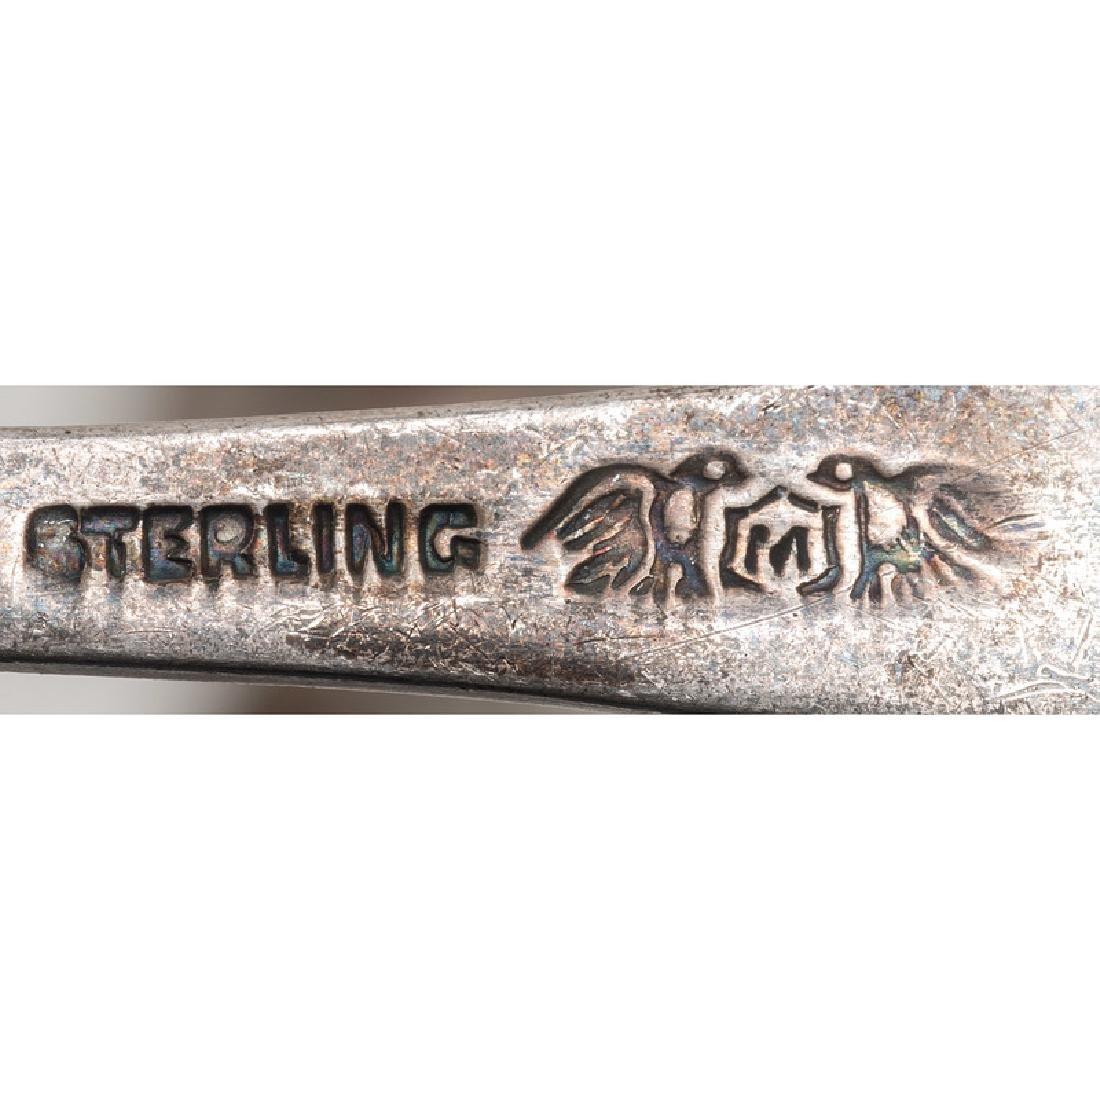 American Sterling Silver Souvenir Spoons - 6